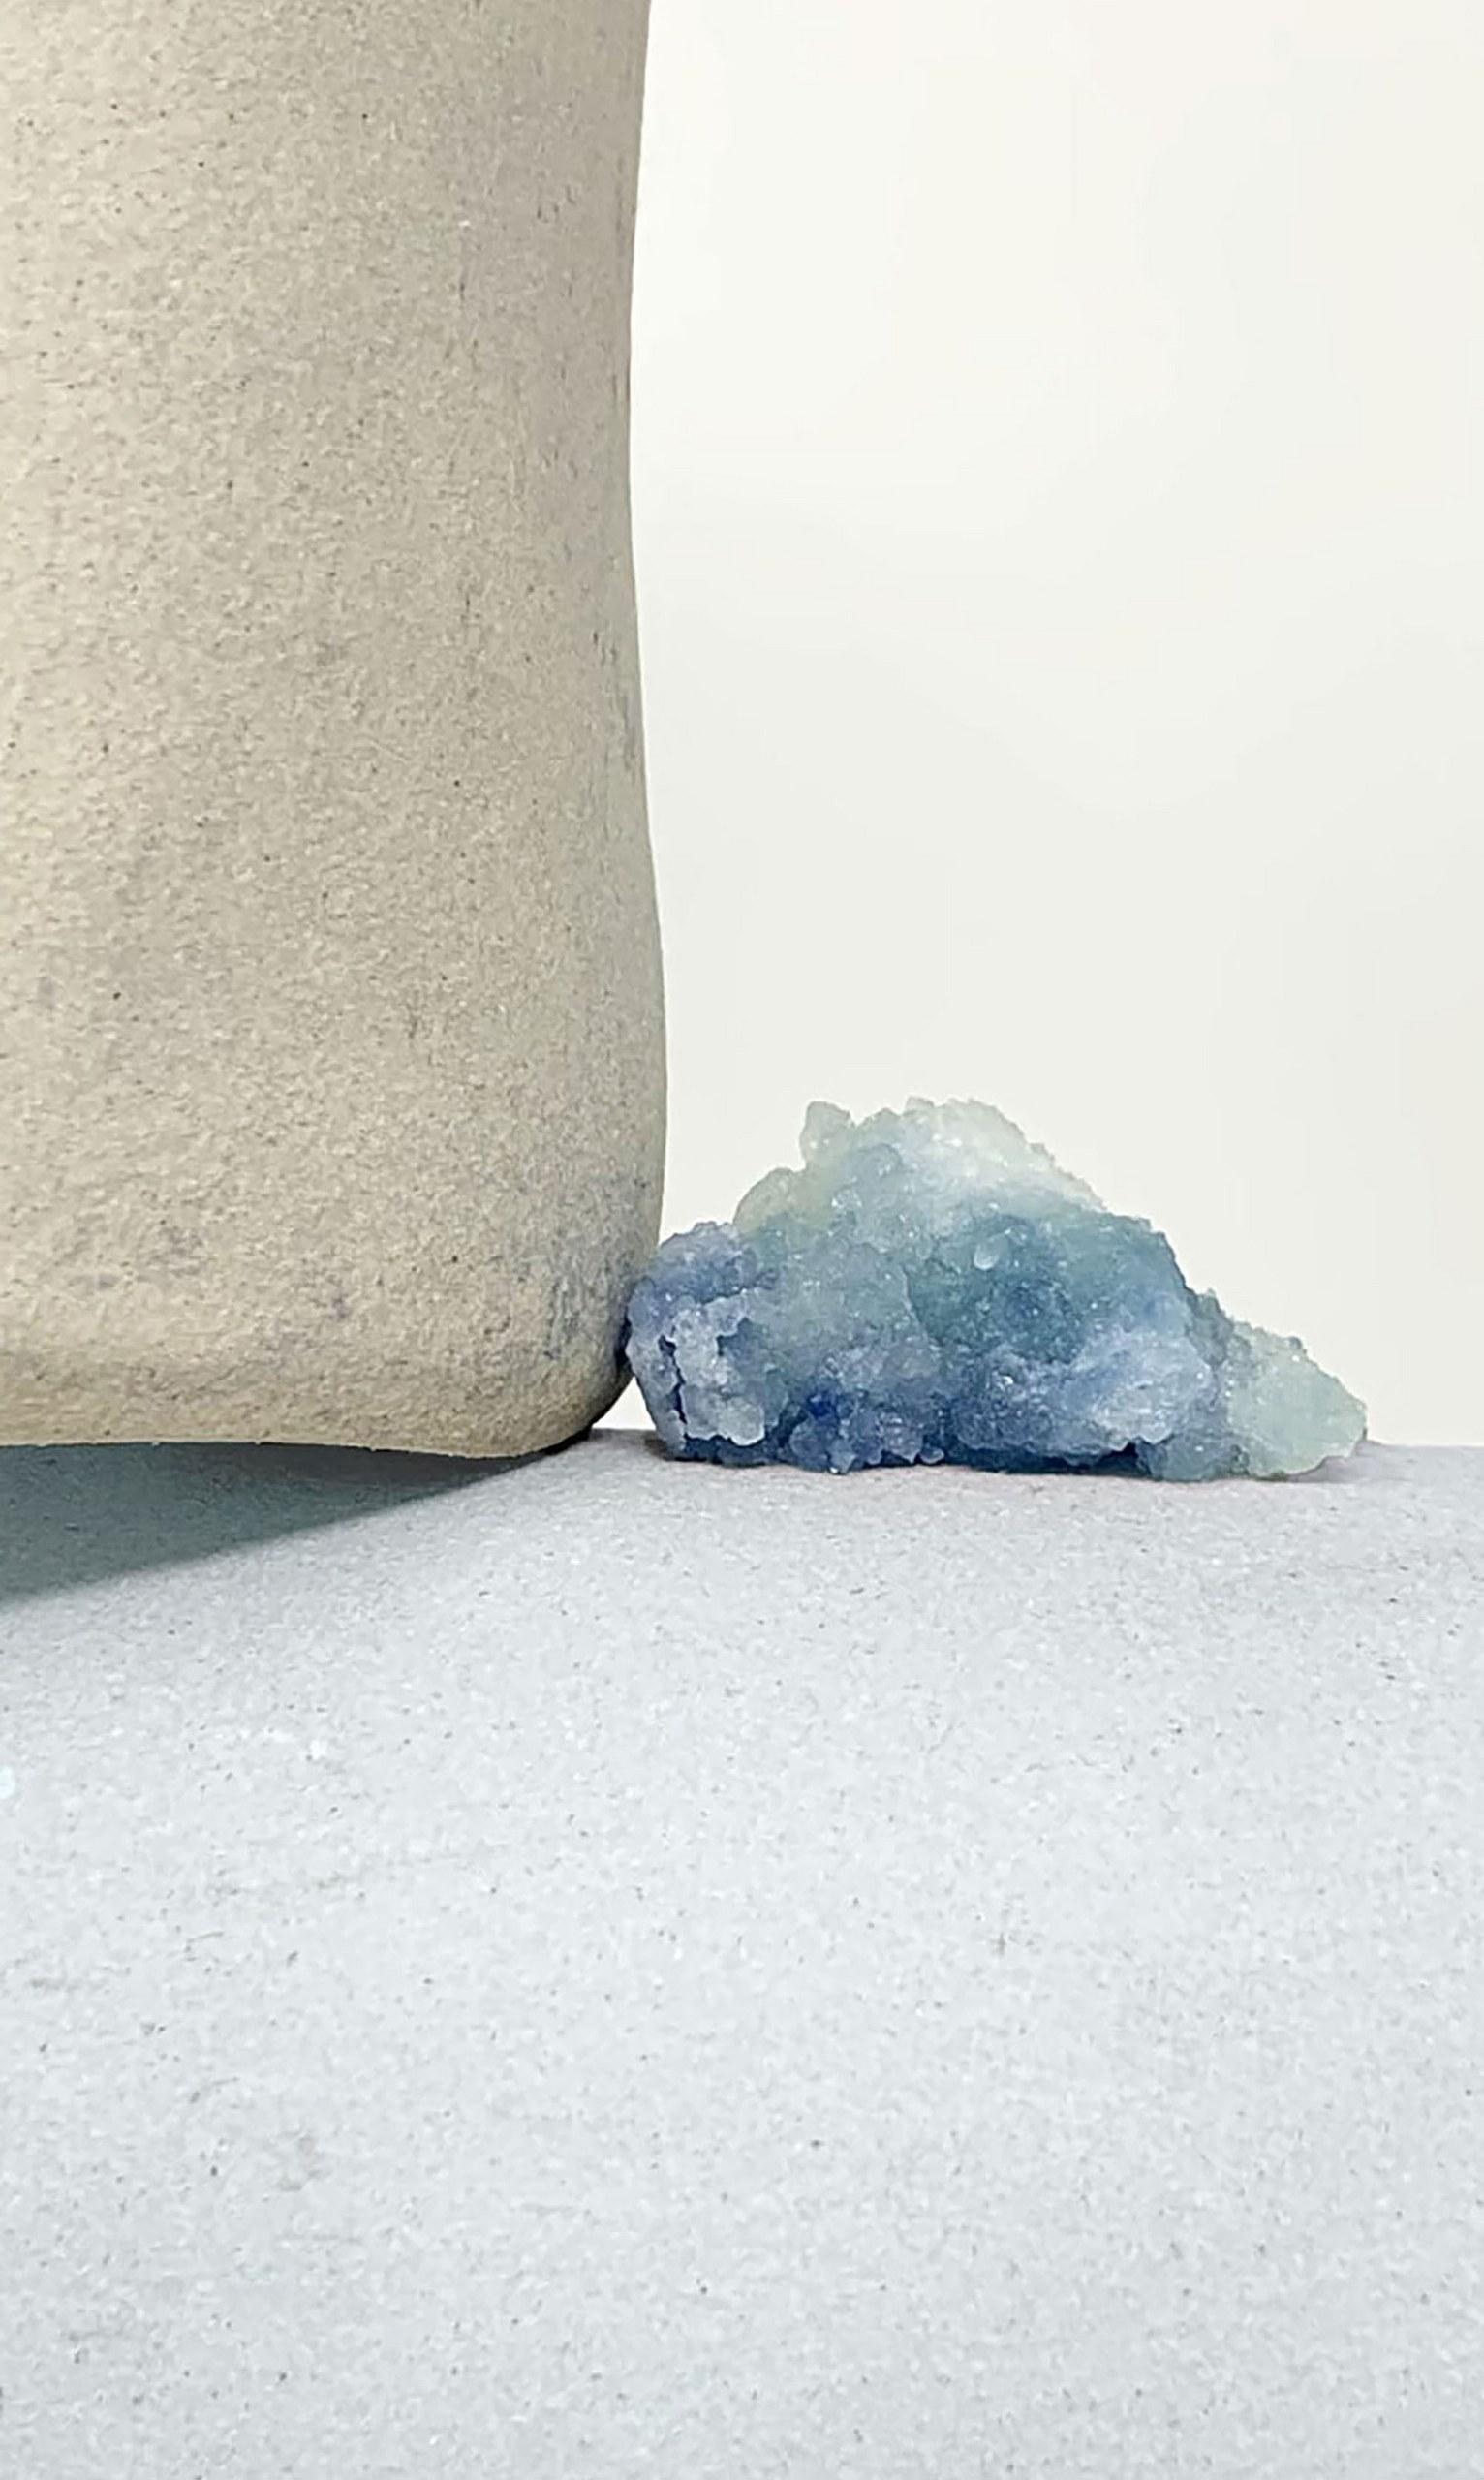 Scar Tissue - detail - crystallised sugar